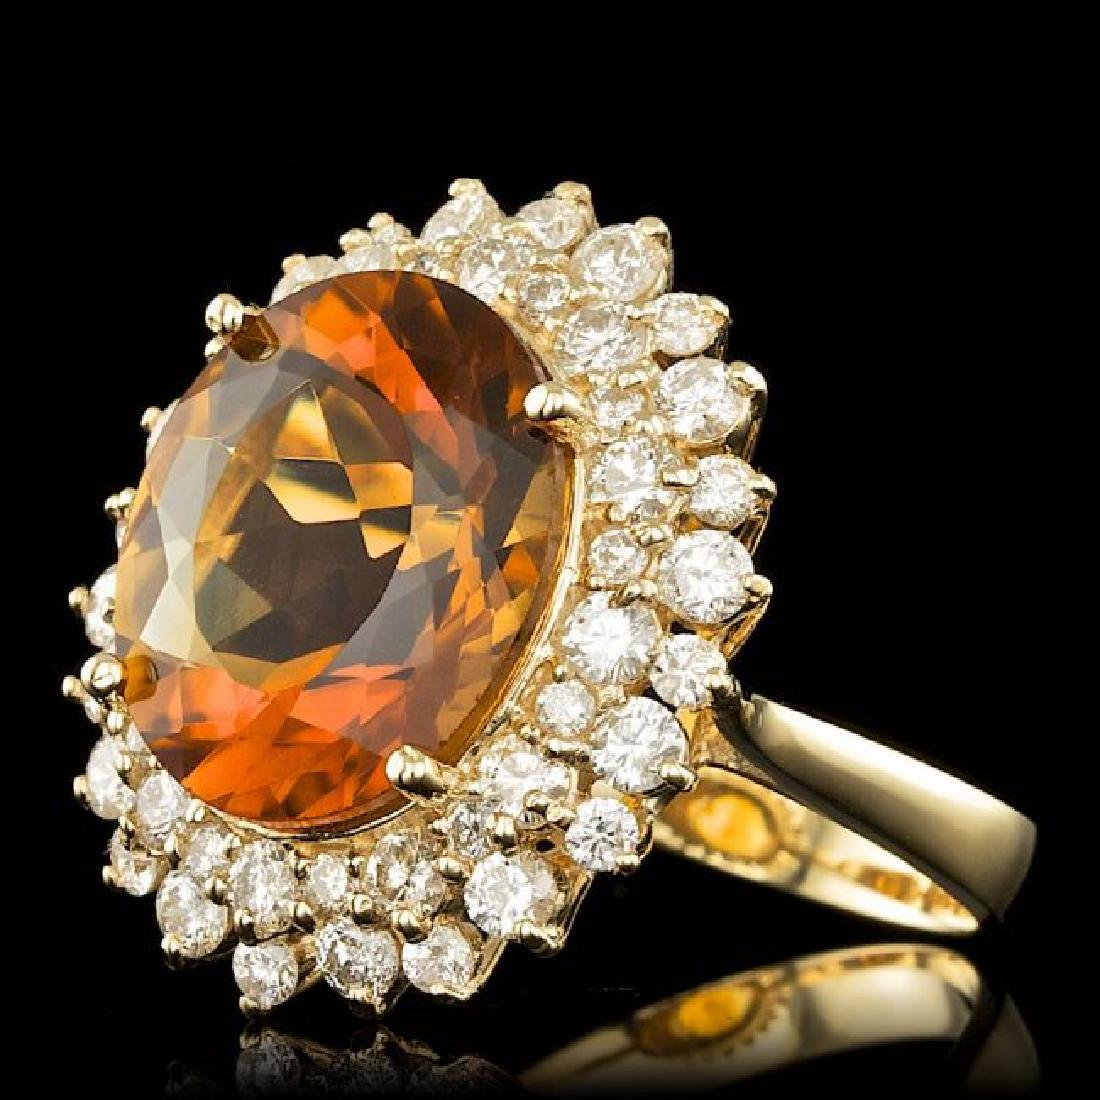 14k Gold 7.00ct Citrine 1.75ct Diamond Ring - 2